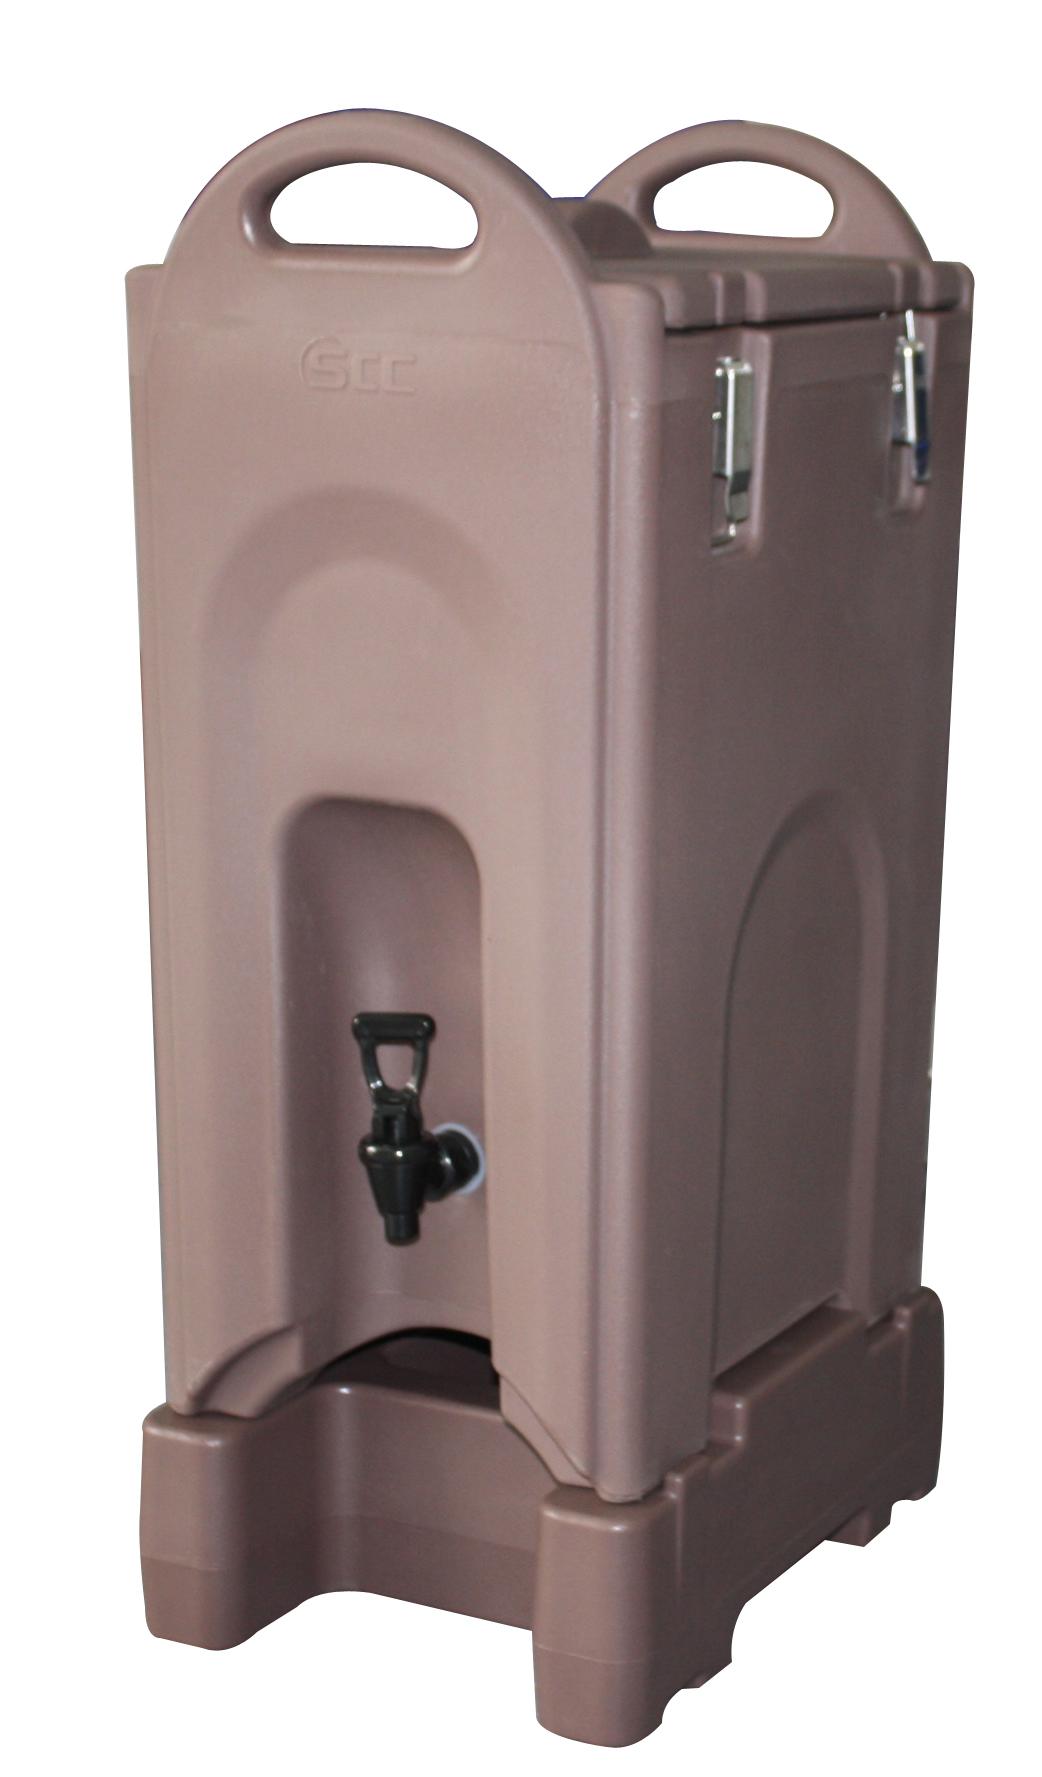 26L Beverage dispenser SB3-A26